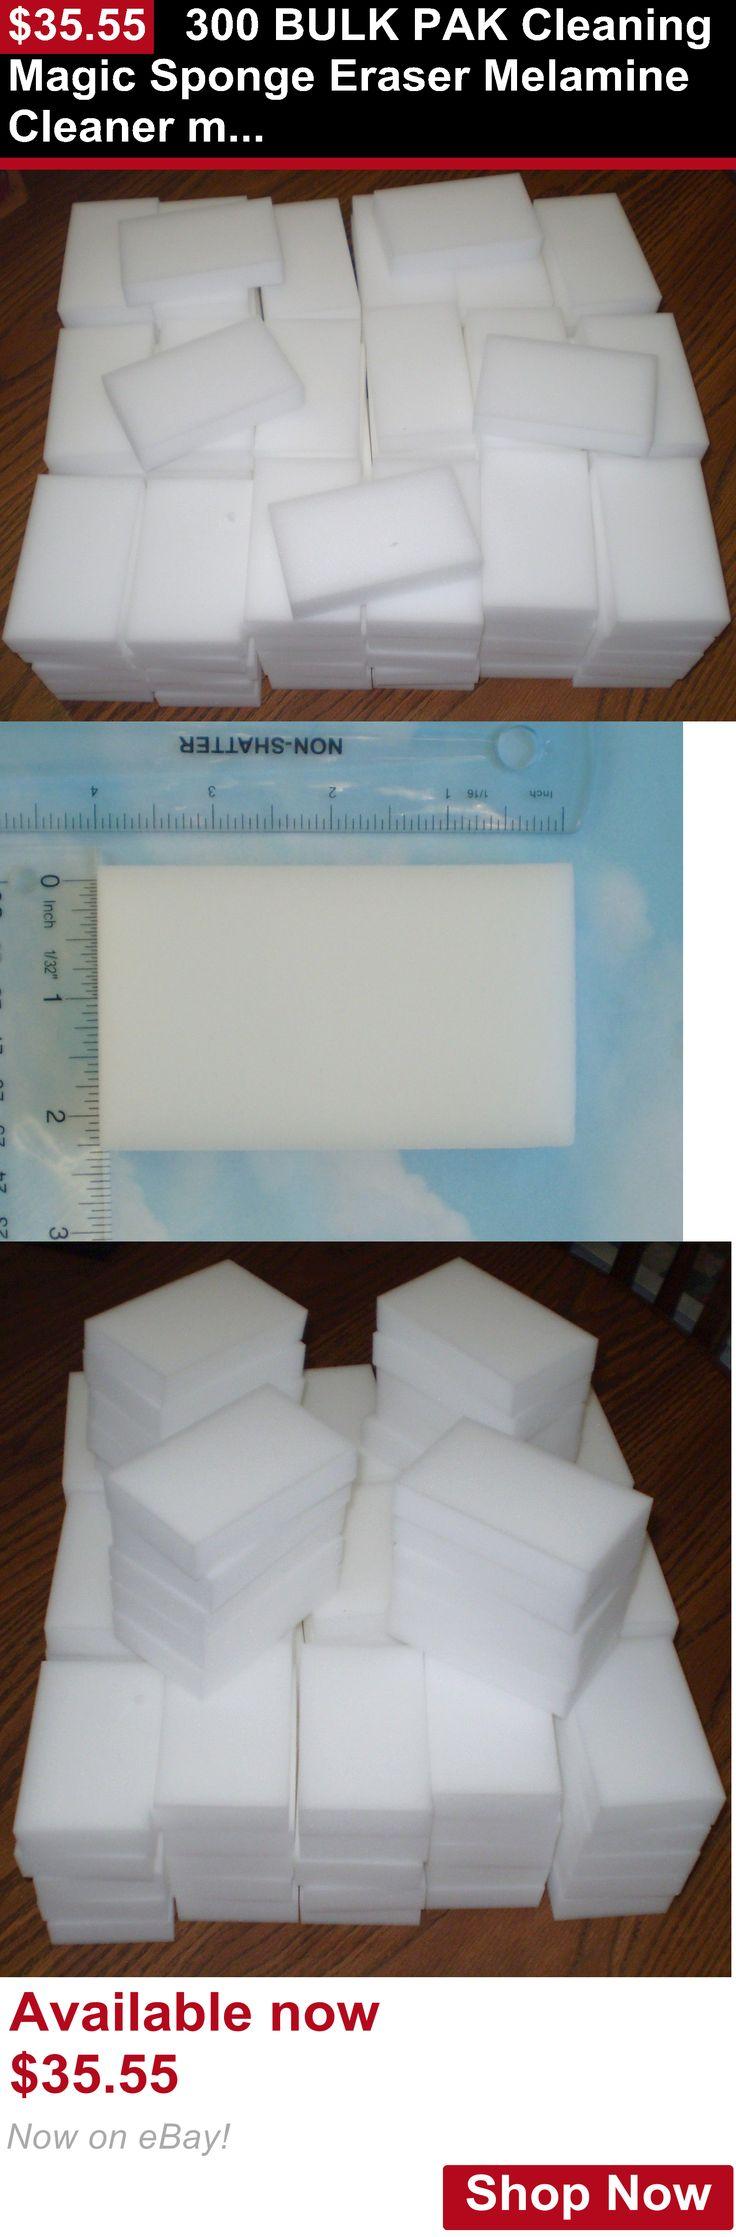 Telescope Eyepieces And Lenses: 300 Bulk Pak Cleaning Magic Sponge Eraser Melamine Cleaner Multi-Functional Foam BUY IT NOW ONLY: $35.55